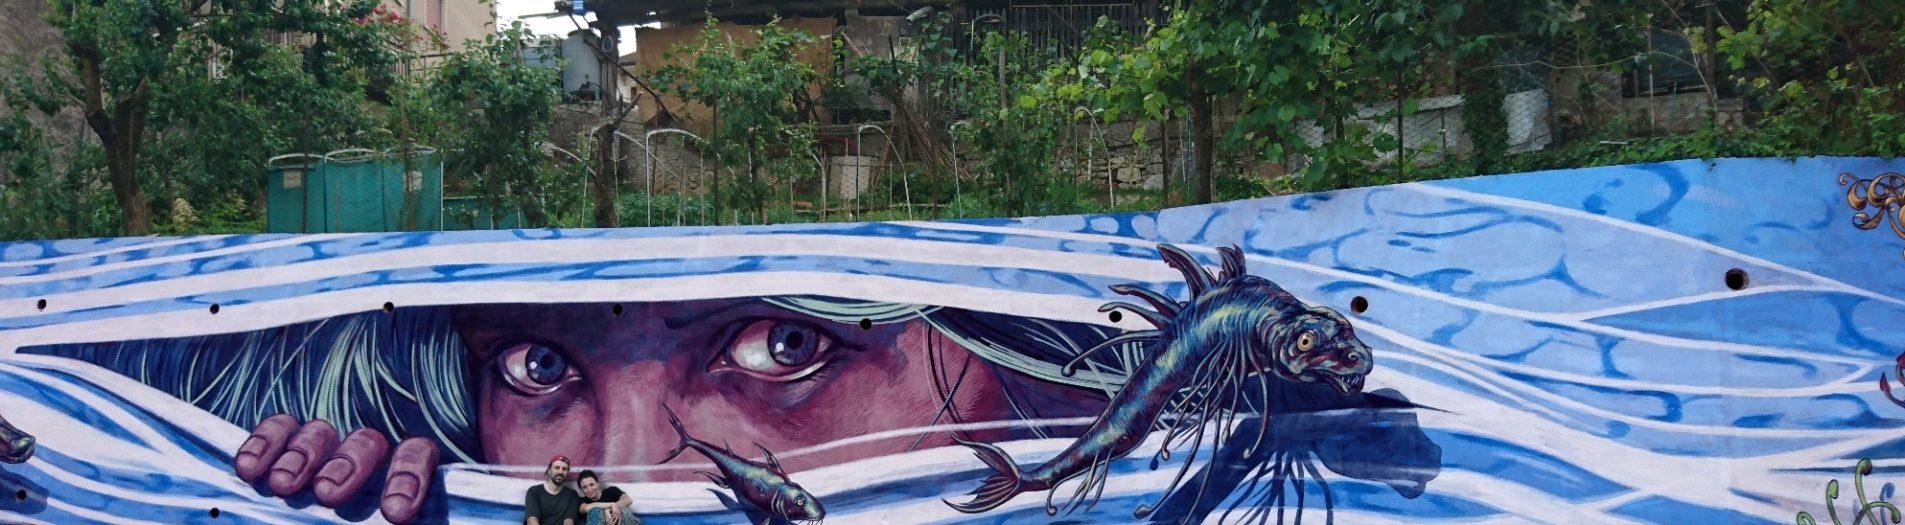 Anguane e pesci abissali a Crespadoro